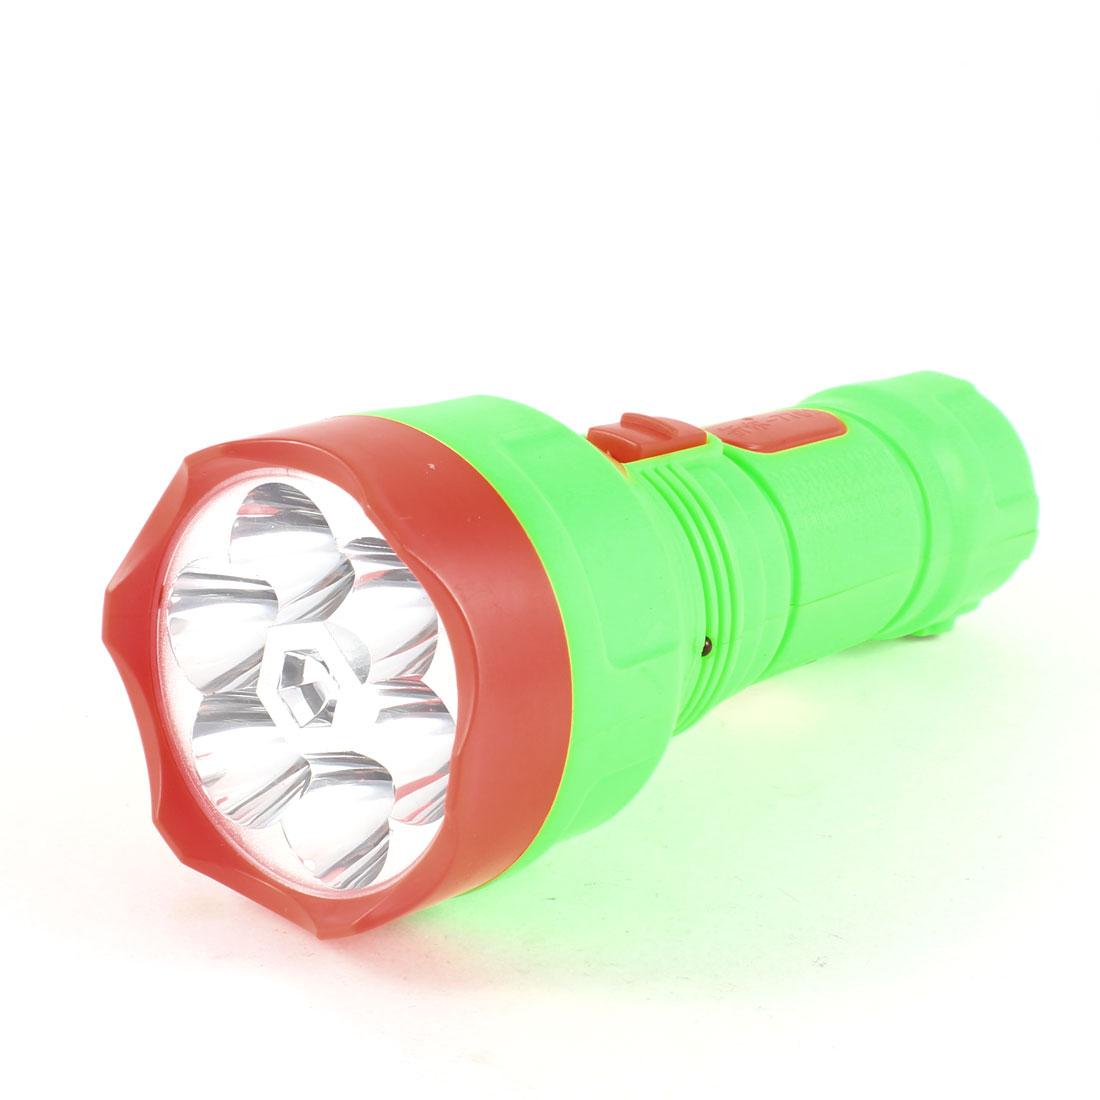 US Plug White Light 7 LED Lighting Rechargeable Flashlight Torch AC 110V-220V